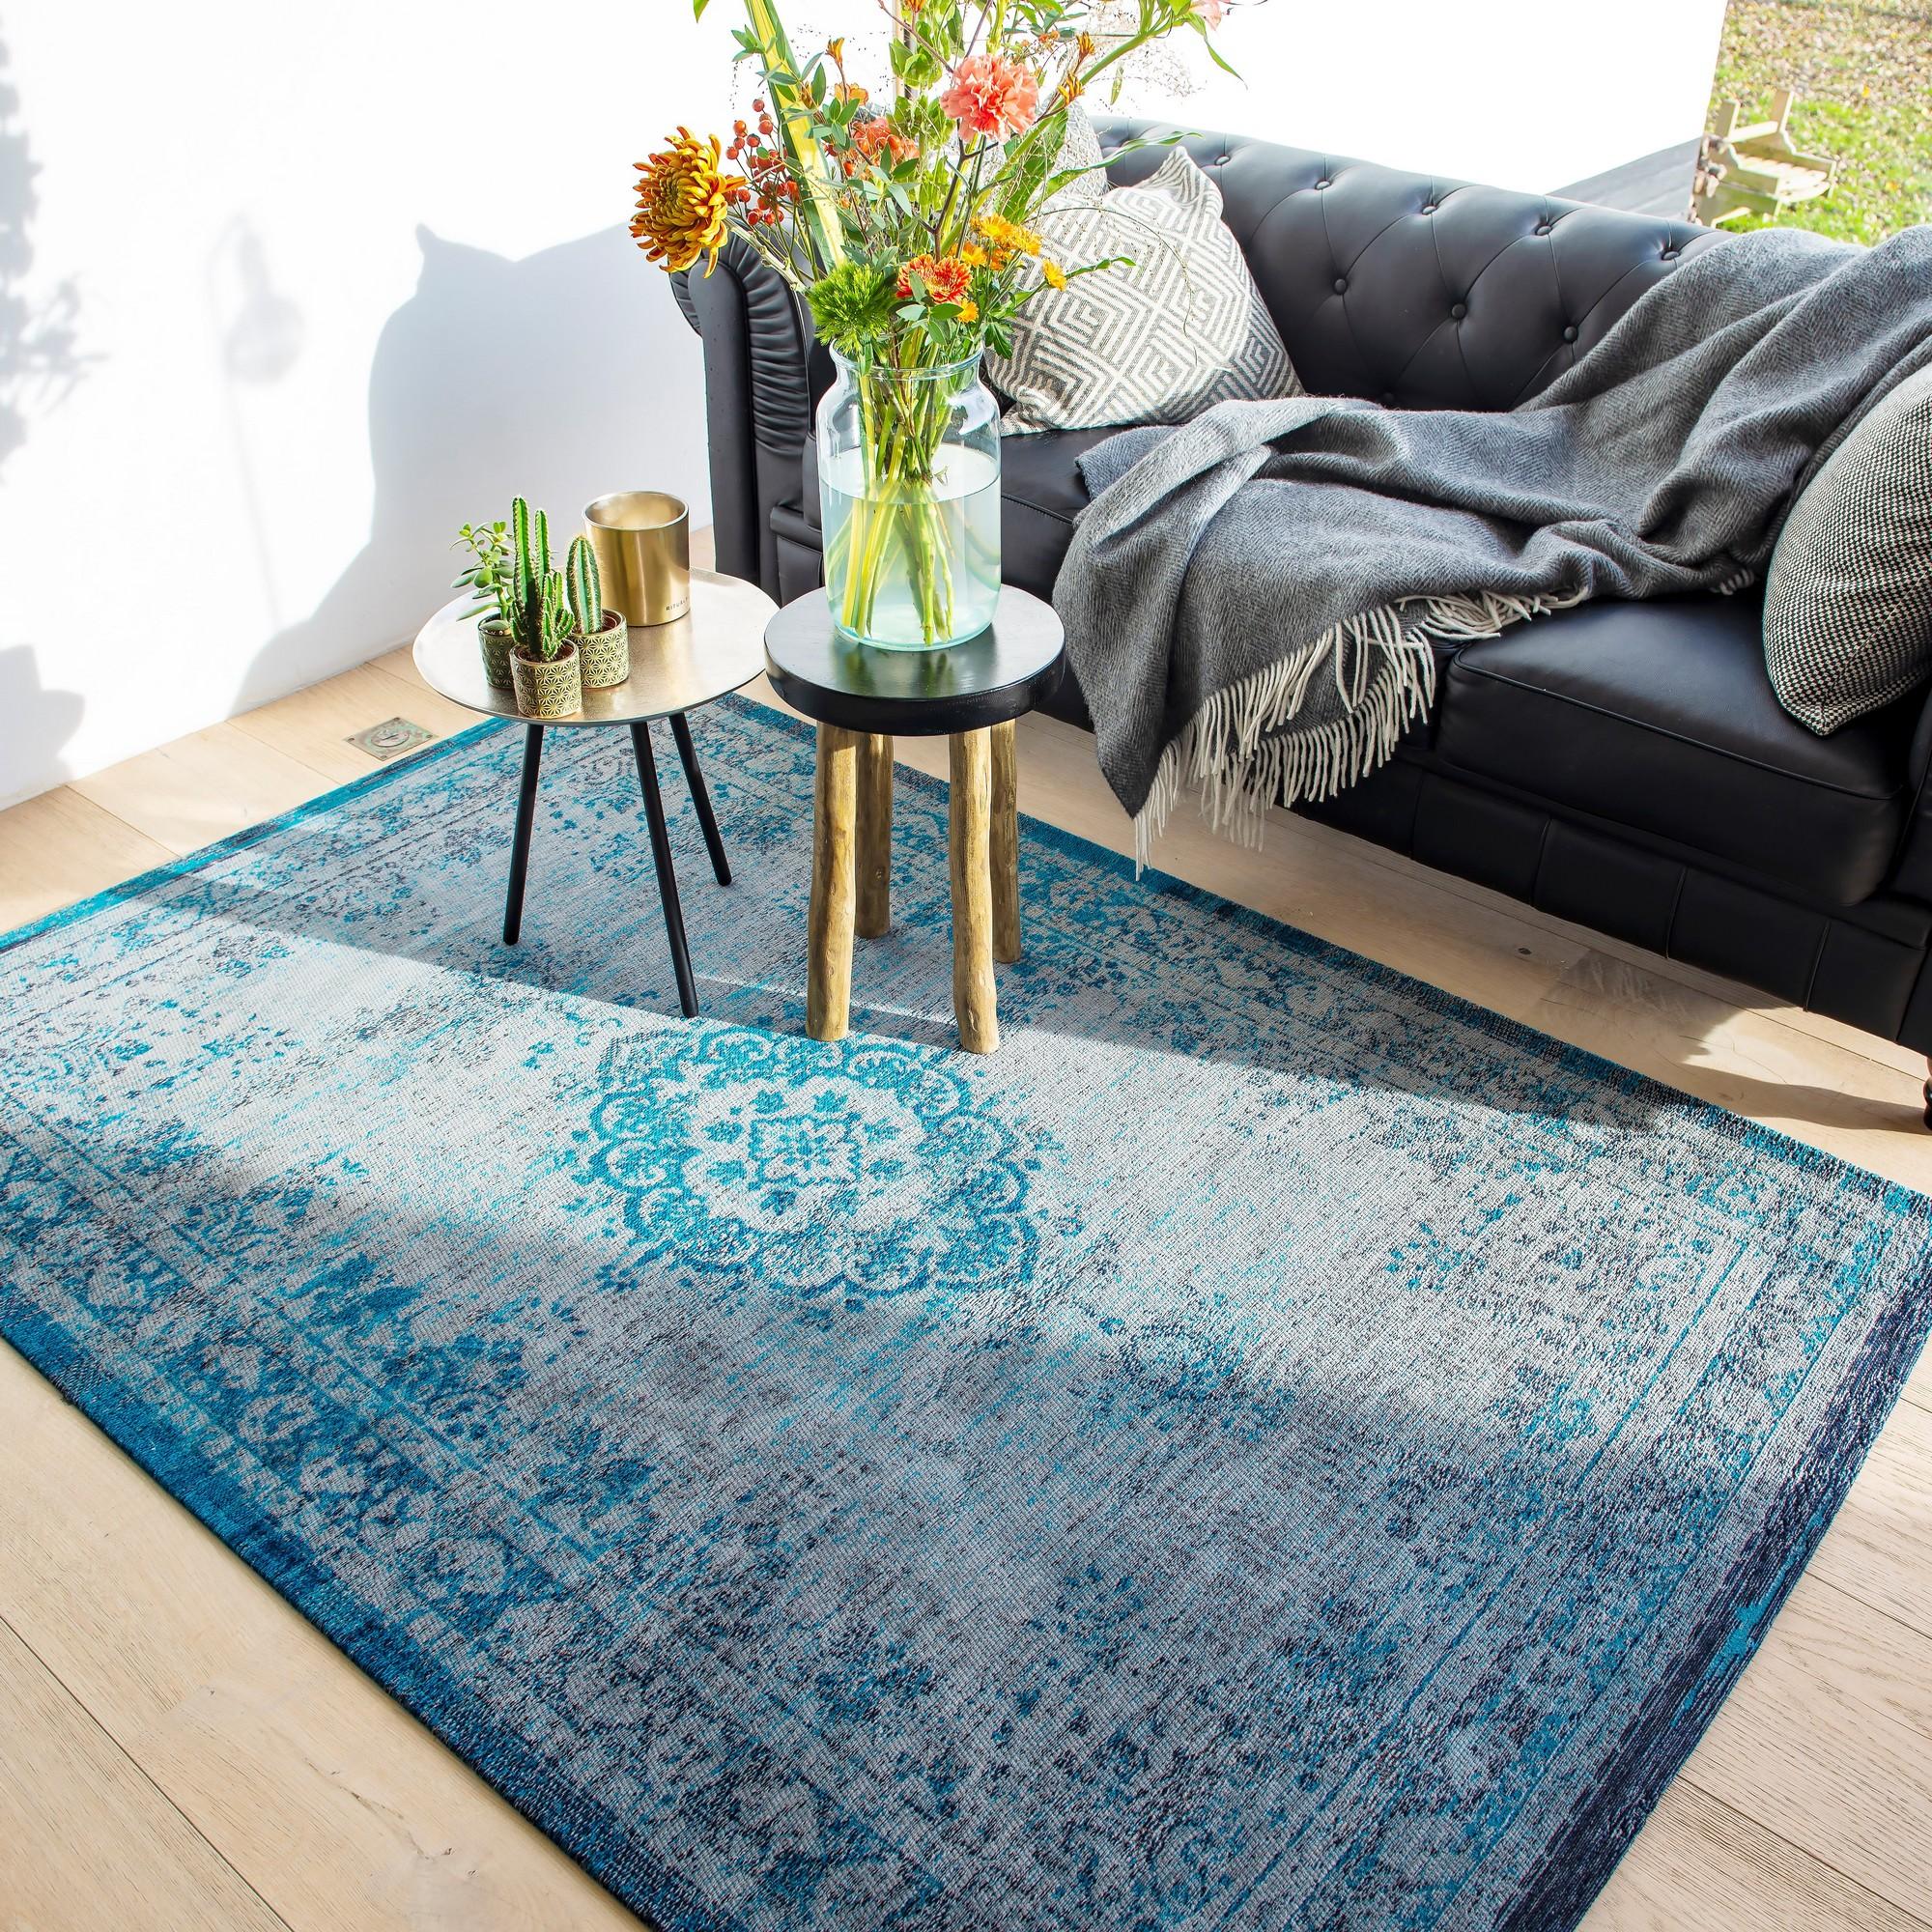 louis de poortere fading world rugs 8255 grey turquoise free uk delivery the rug seller. Black Bedroom Furniture Sets. Home Design Ideas